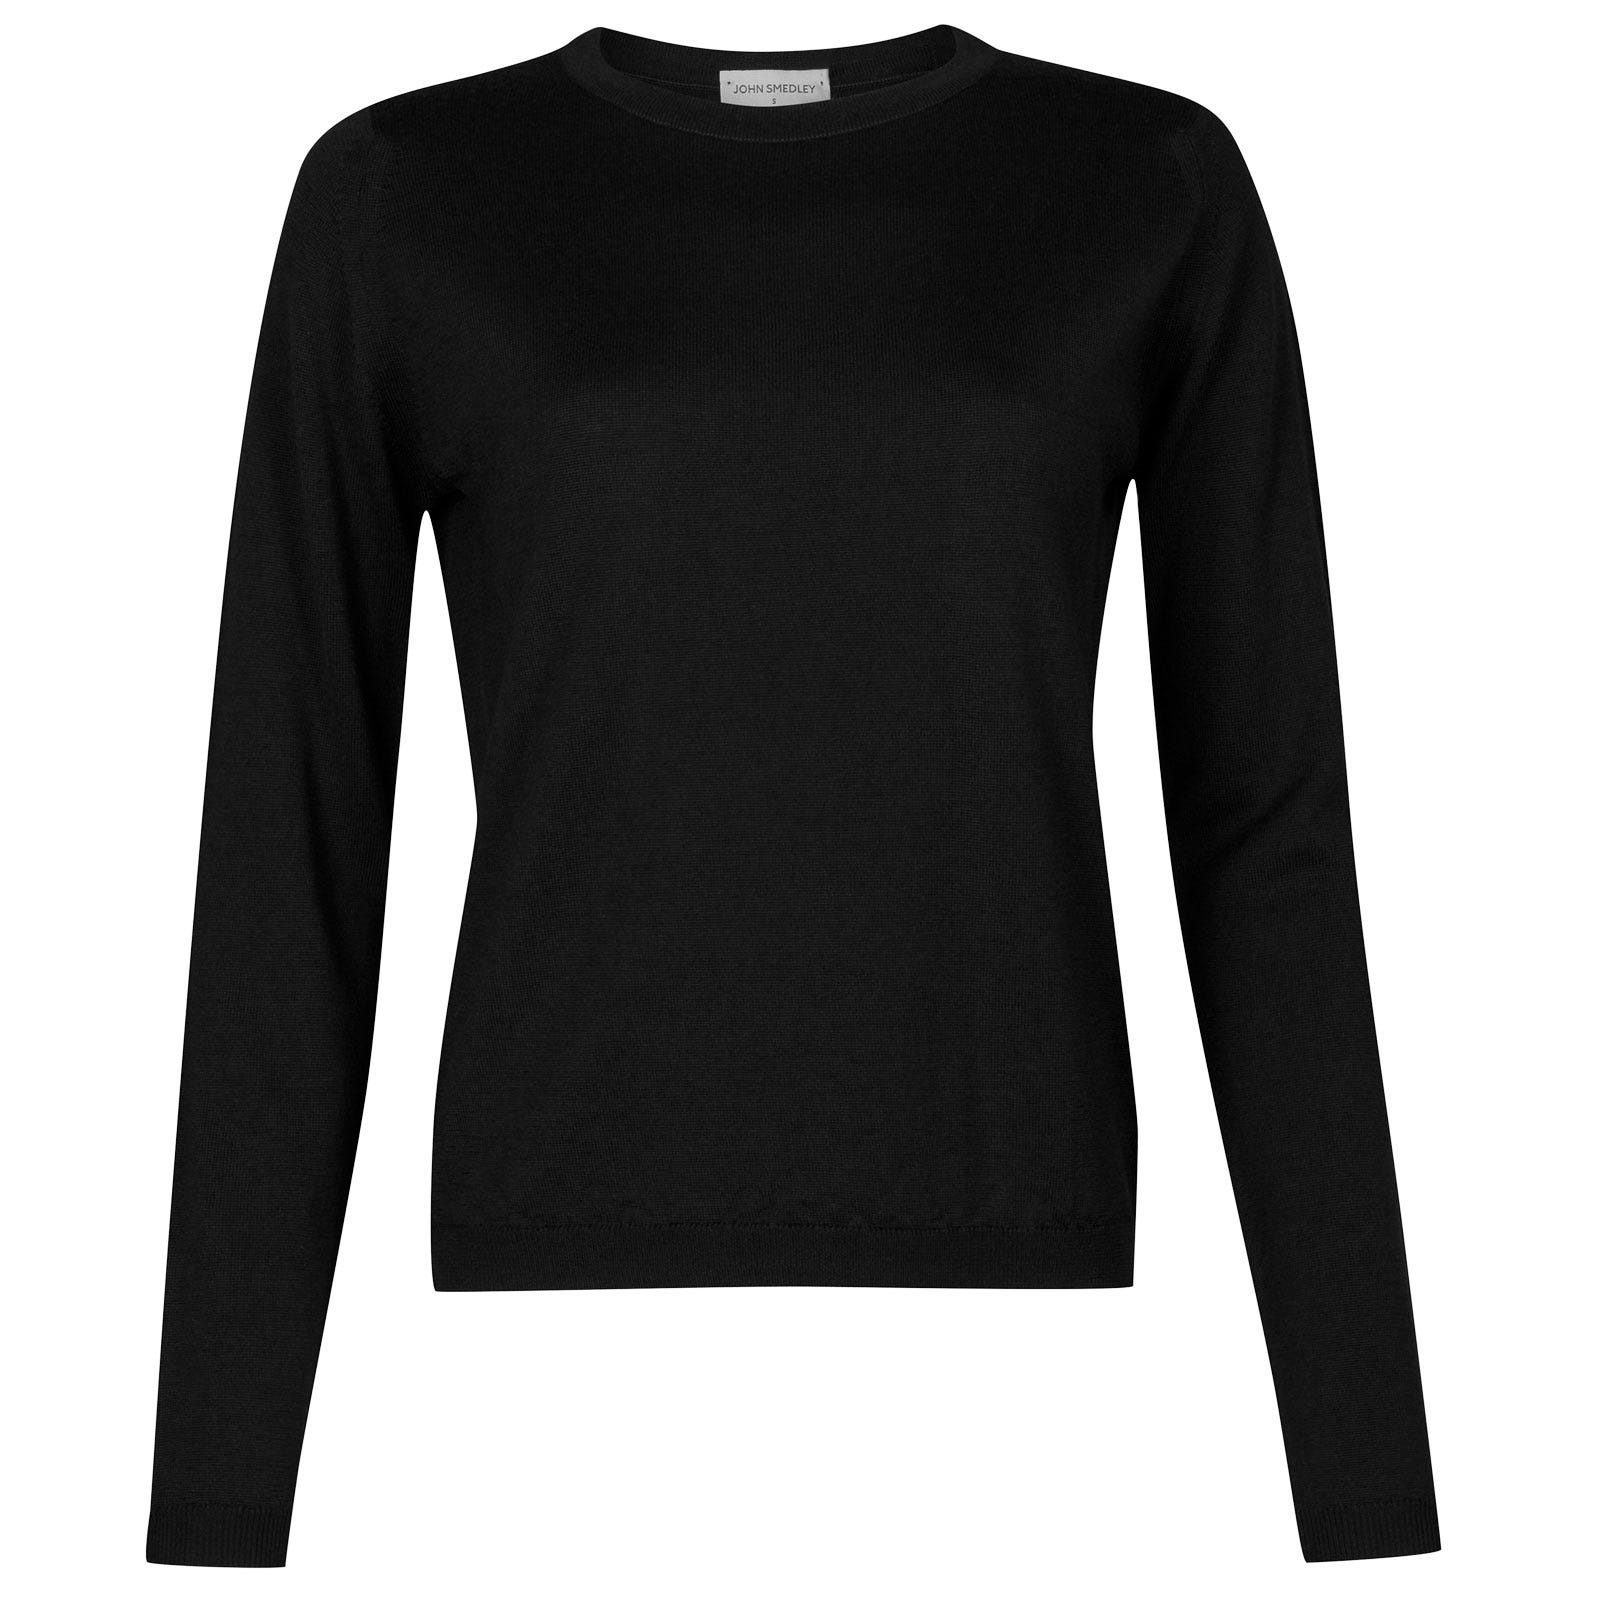 John Smedley Edmee Merino Wool Sweater in Black-L